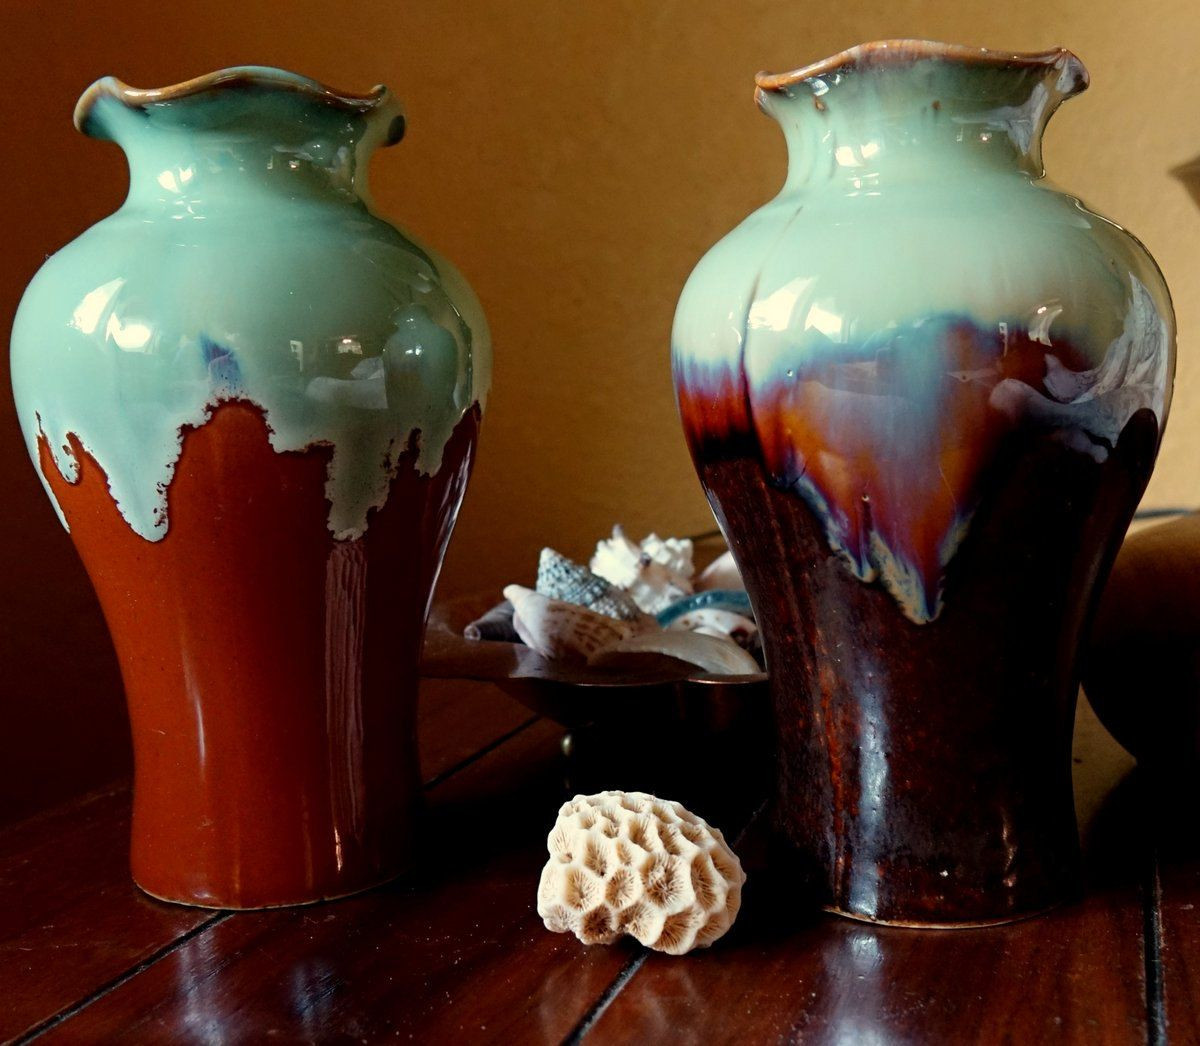 teal ceramic vase of pottery vases set of 2 handmade in vietnam teal and brown decor regarding pottery vases set of 2 handmade in vietnam teal and brown decor flower vases drip glaze set of ruffled edge vases vietnam aqua tan by